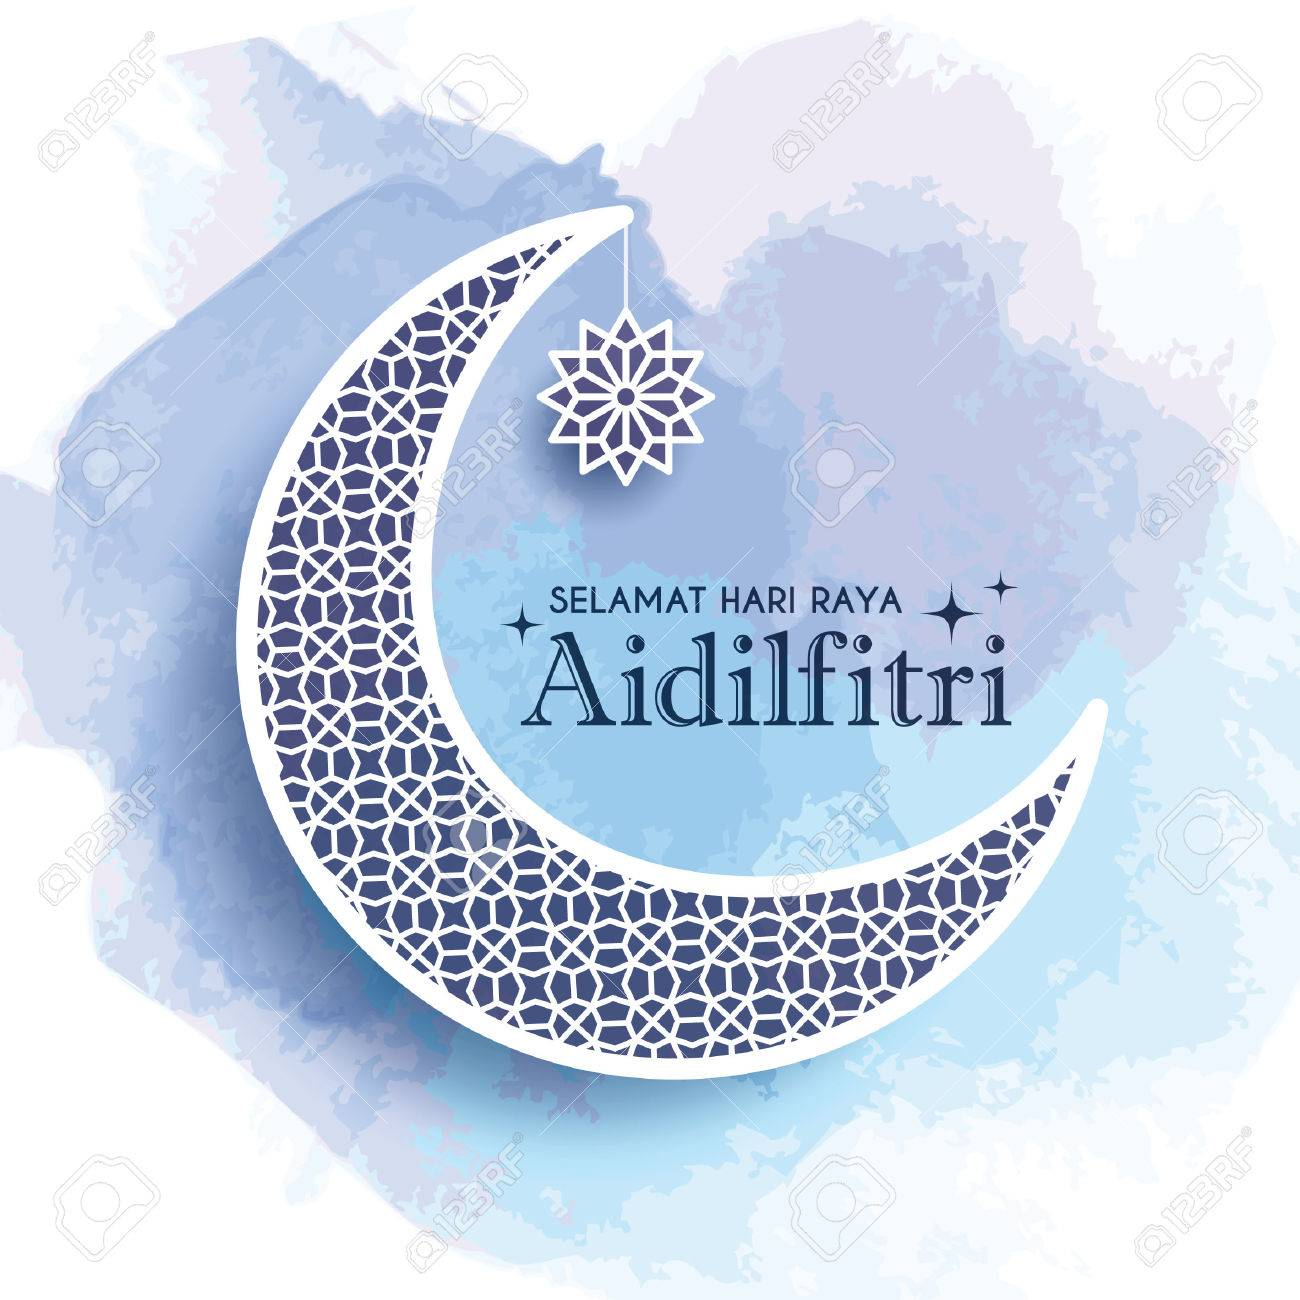 Hari Raya Aidilfitri Greeting Card Template Design Decorative Royalty Free Cliparts Vectors And Stock Illustration Image 80103588